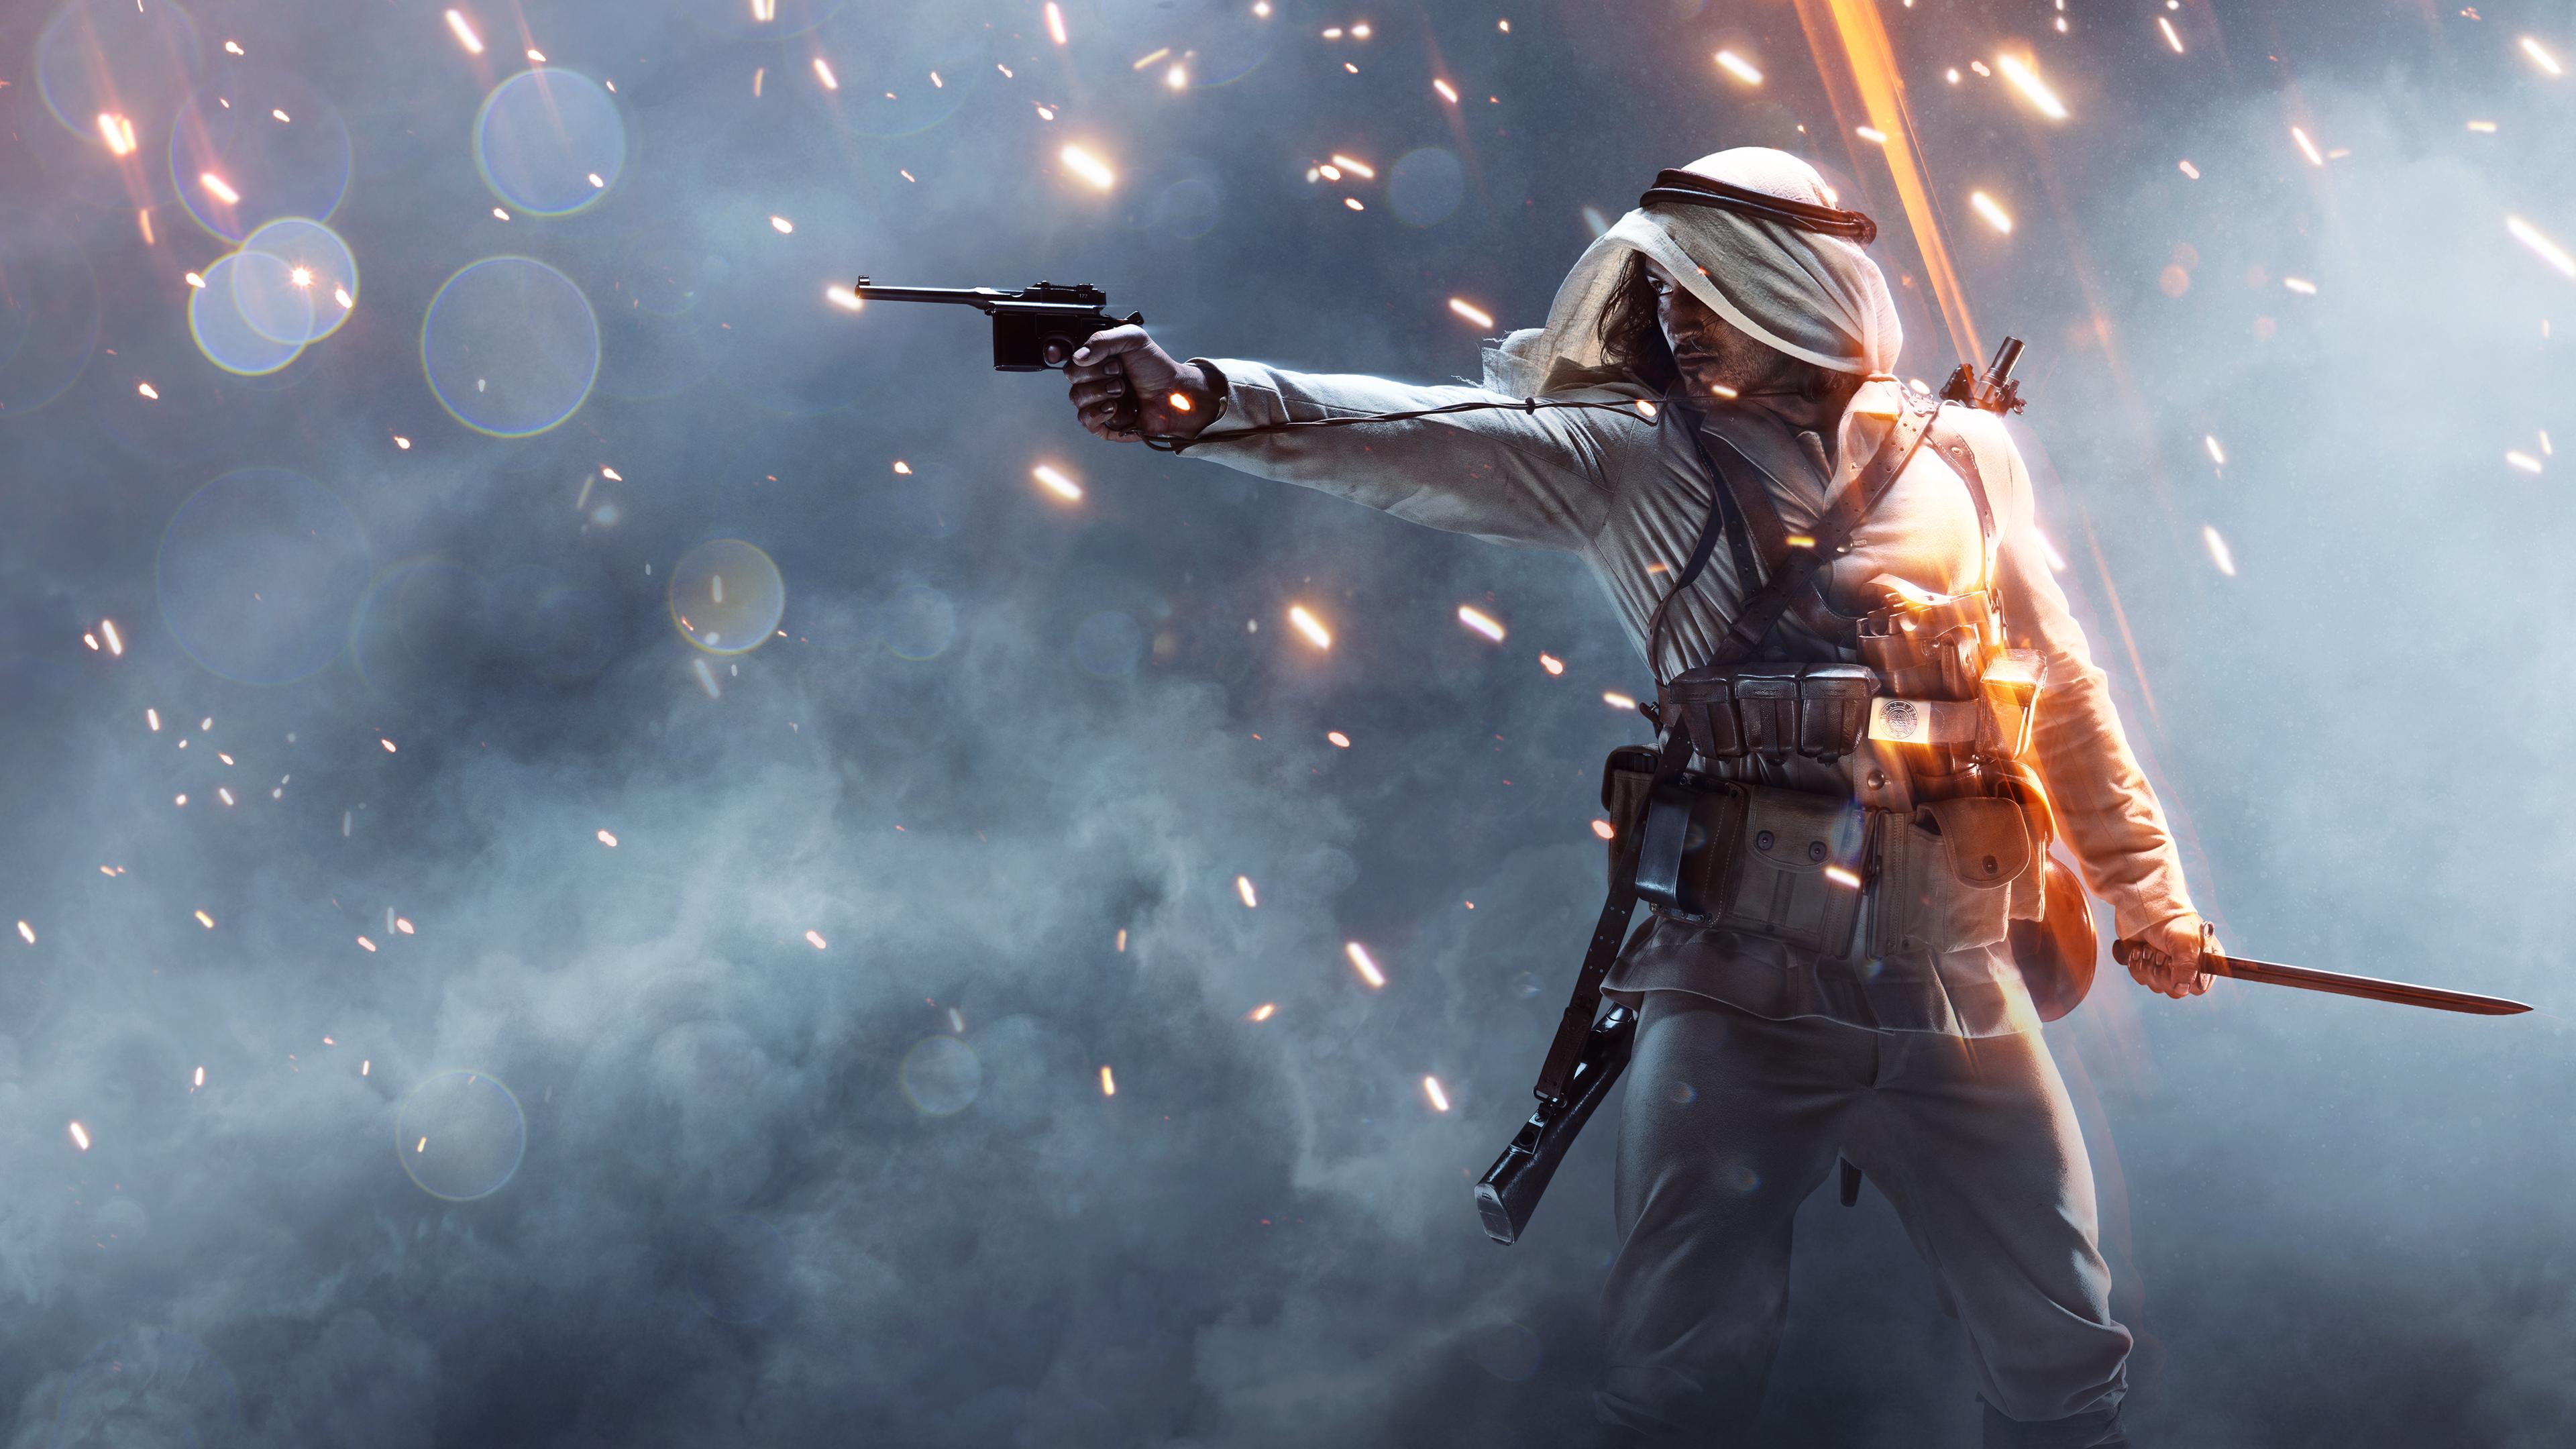 Battlefield Backgrounds